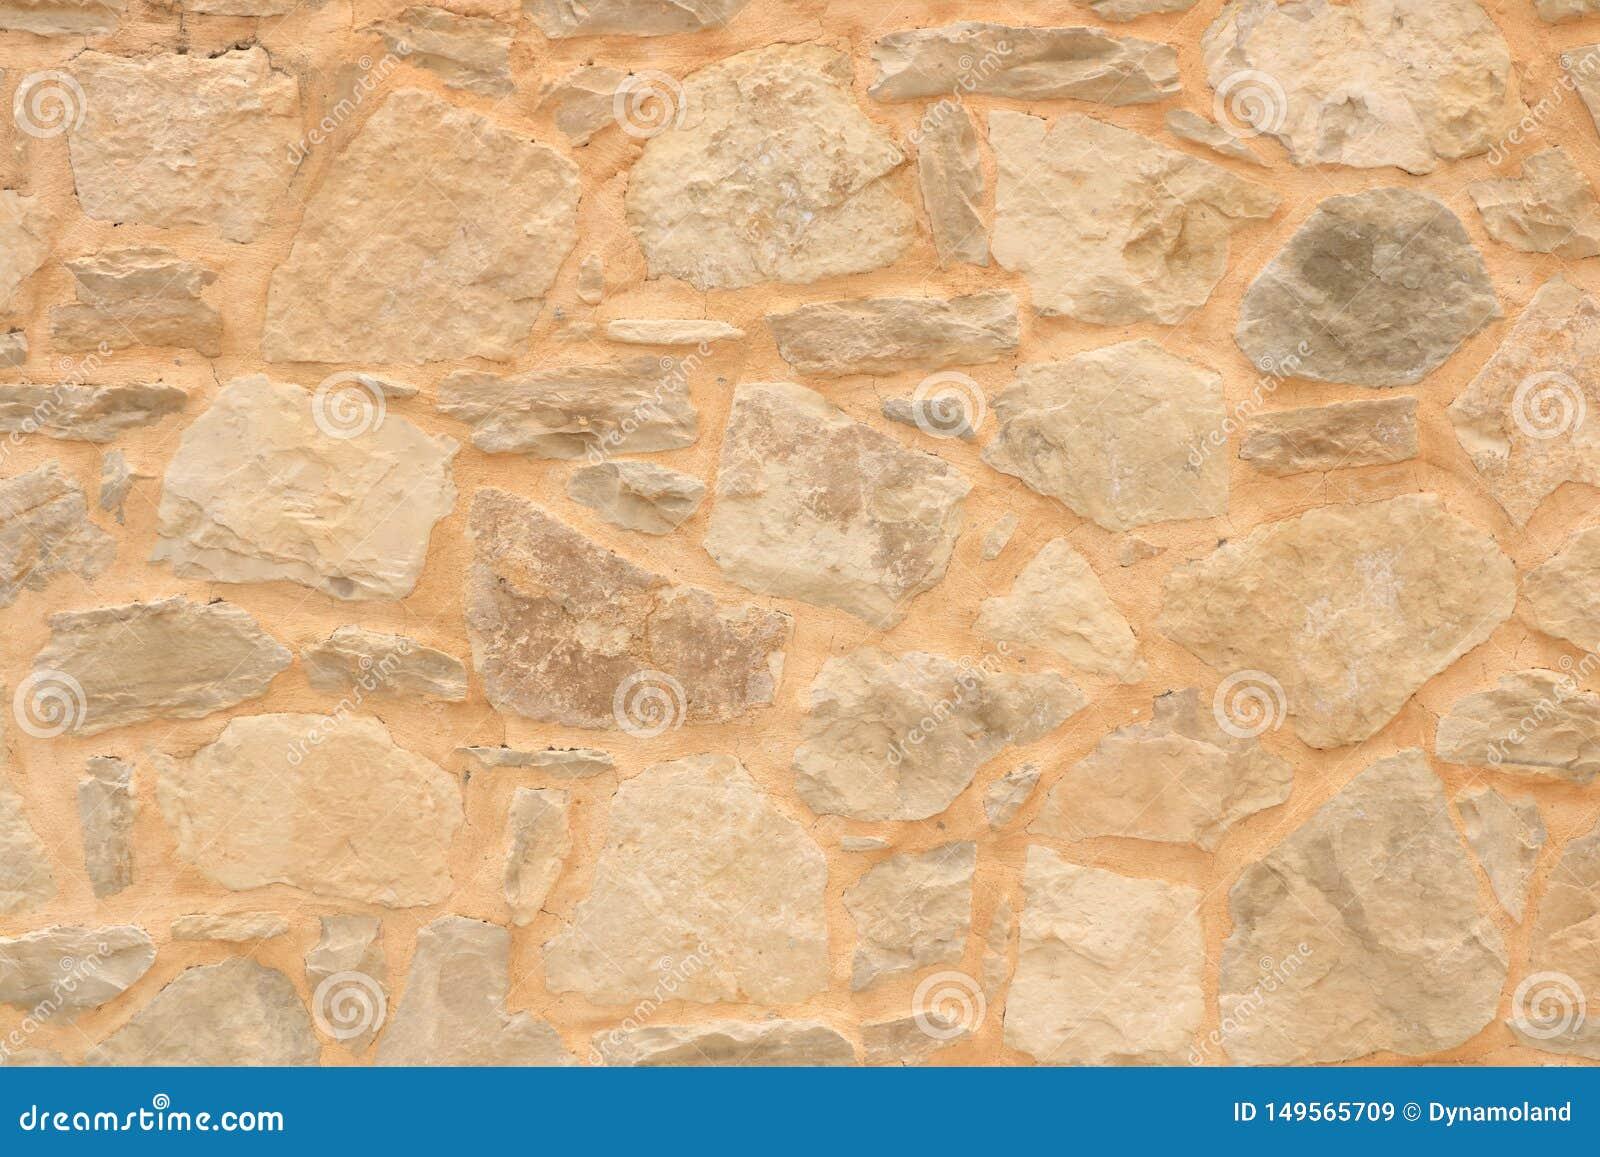 Big yellow wall from stone bricks